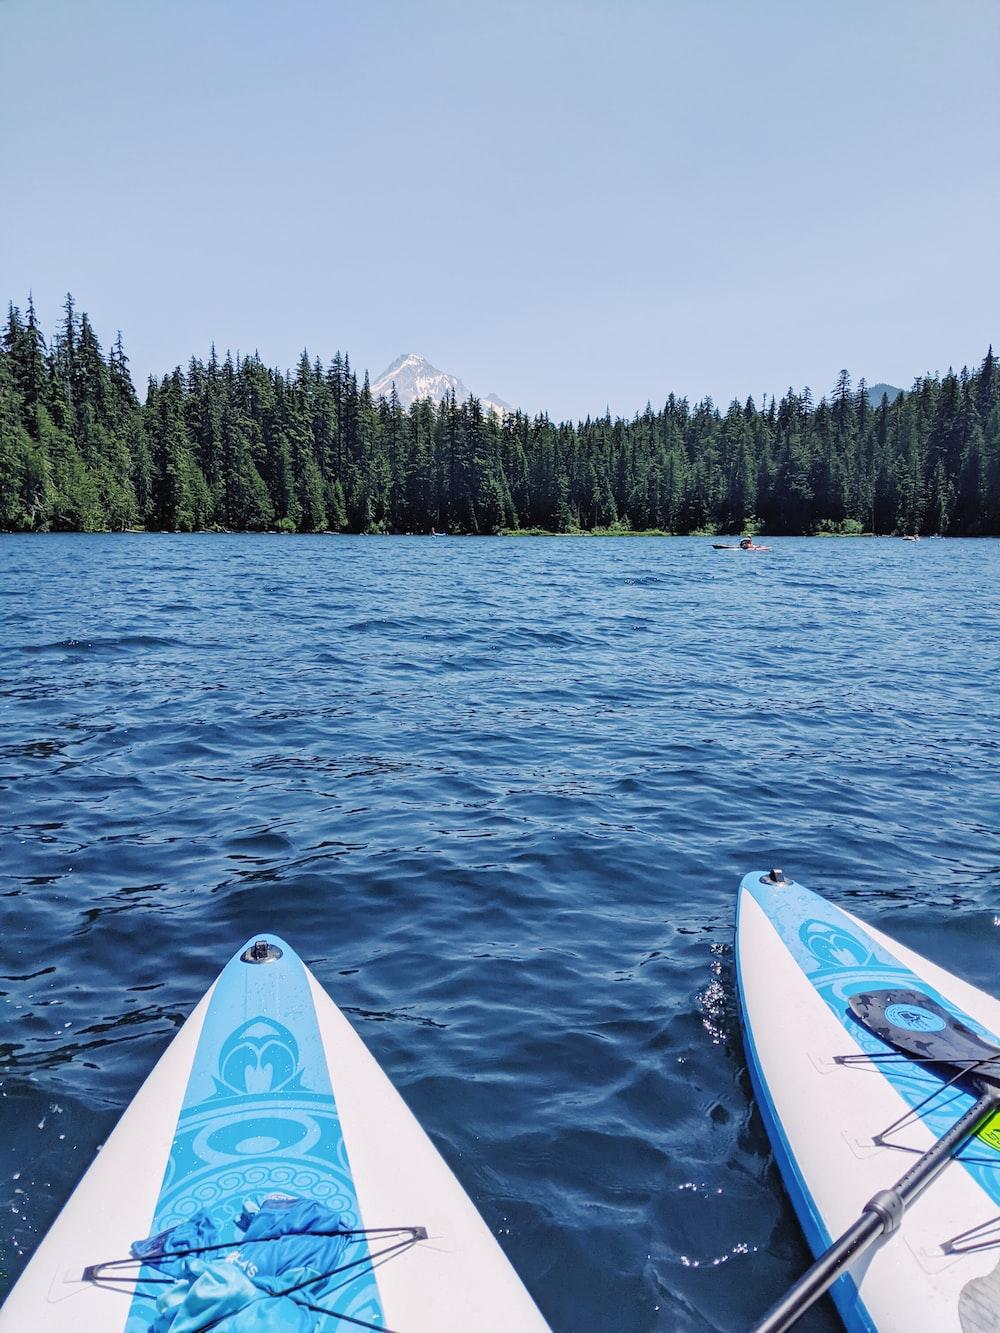 blue and white kayak on sea during daytime